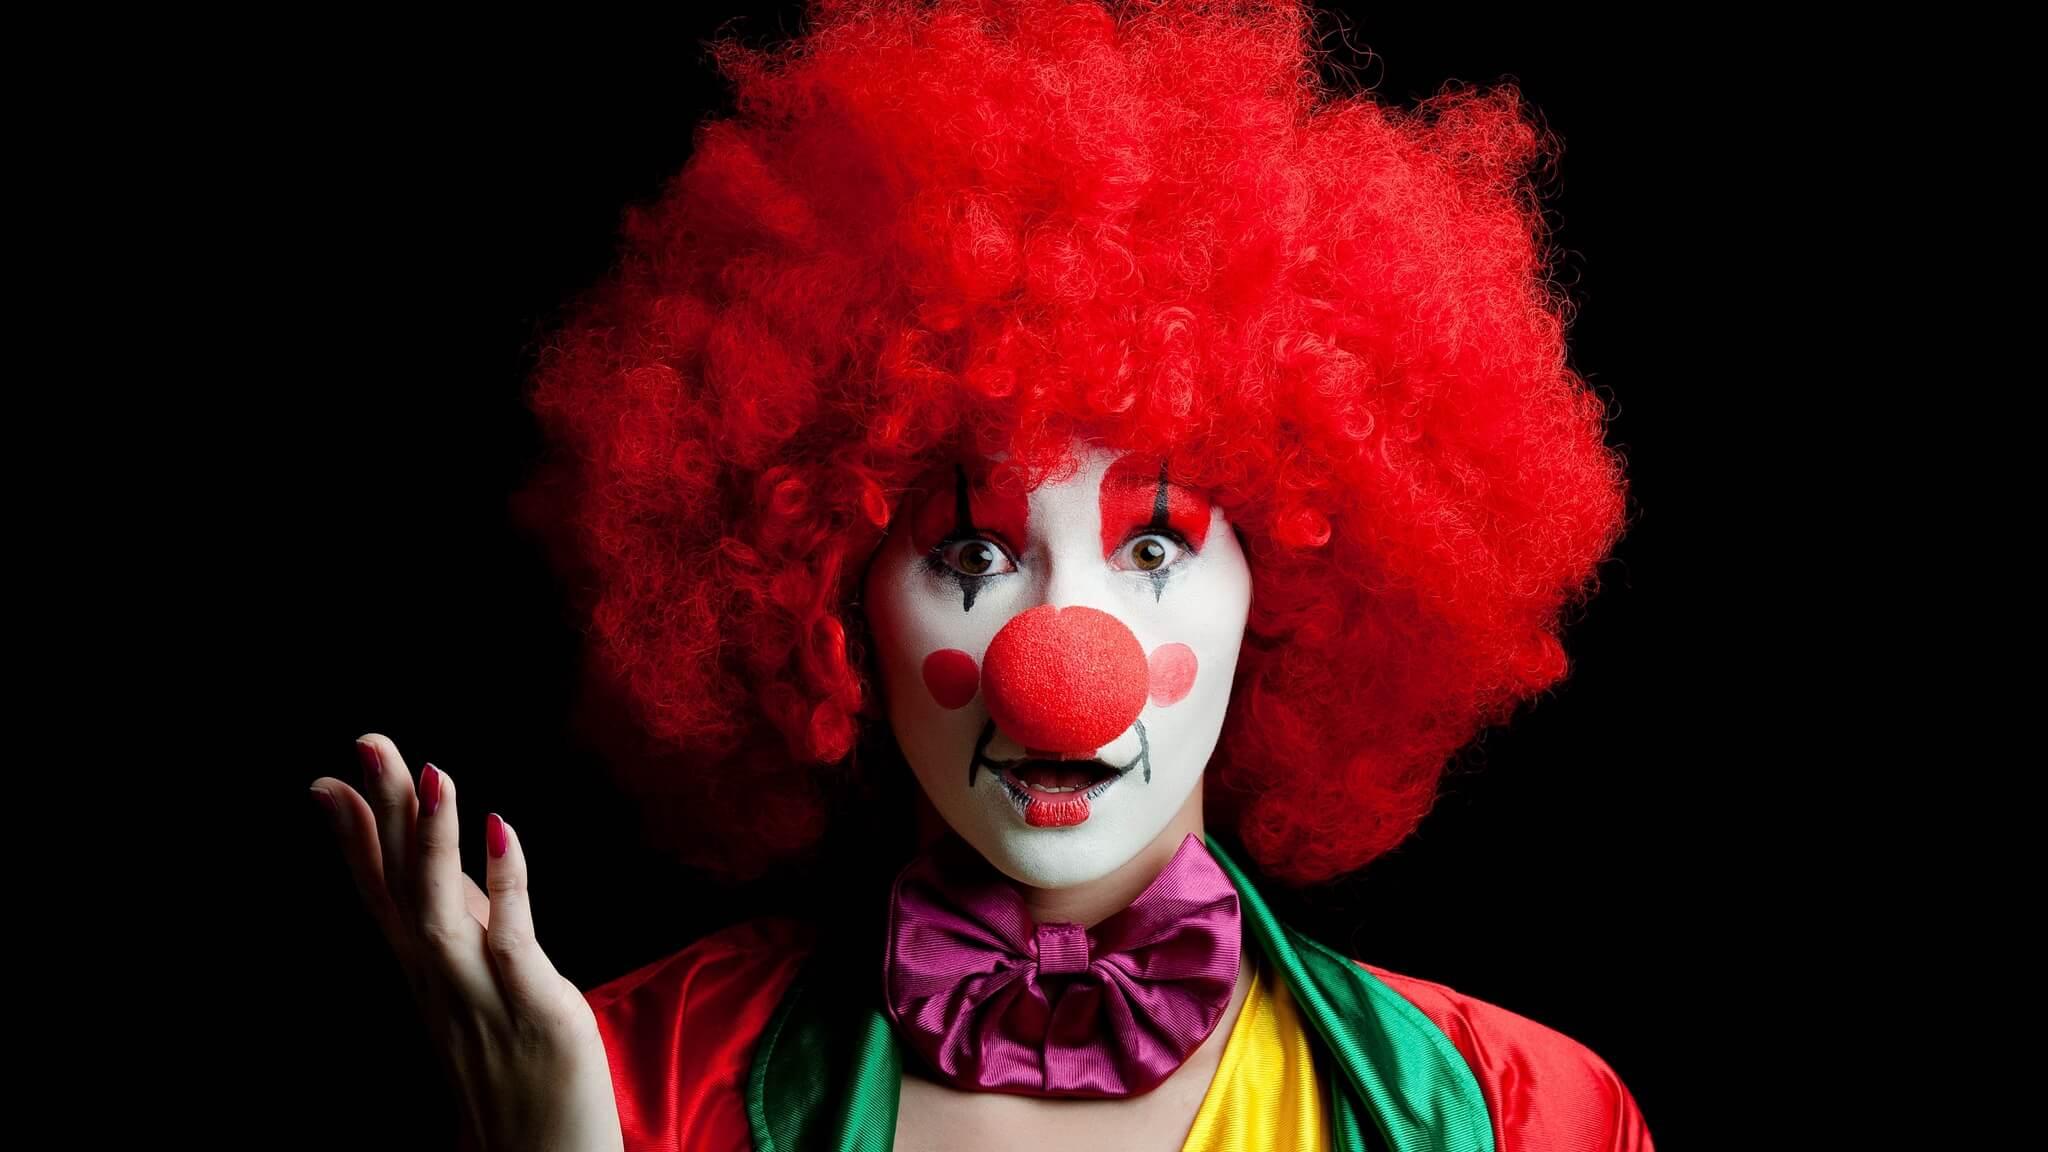 картинка доброго клоуна приятный звук